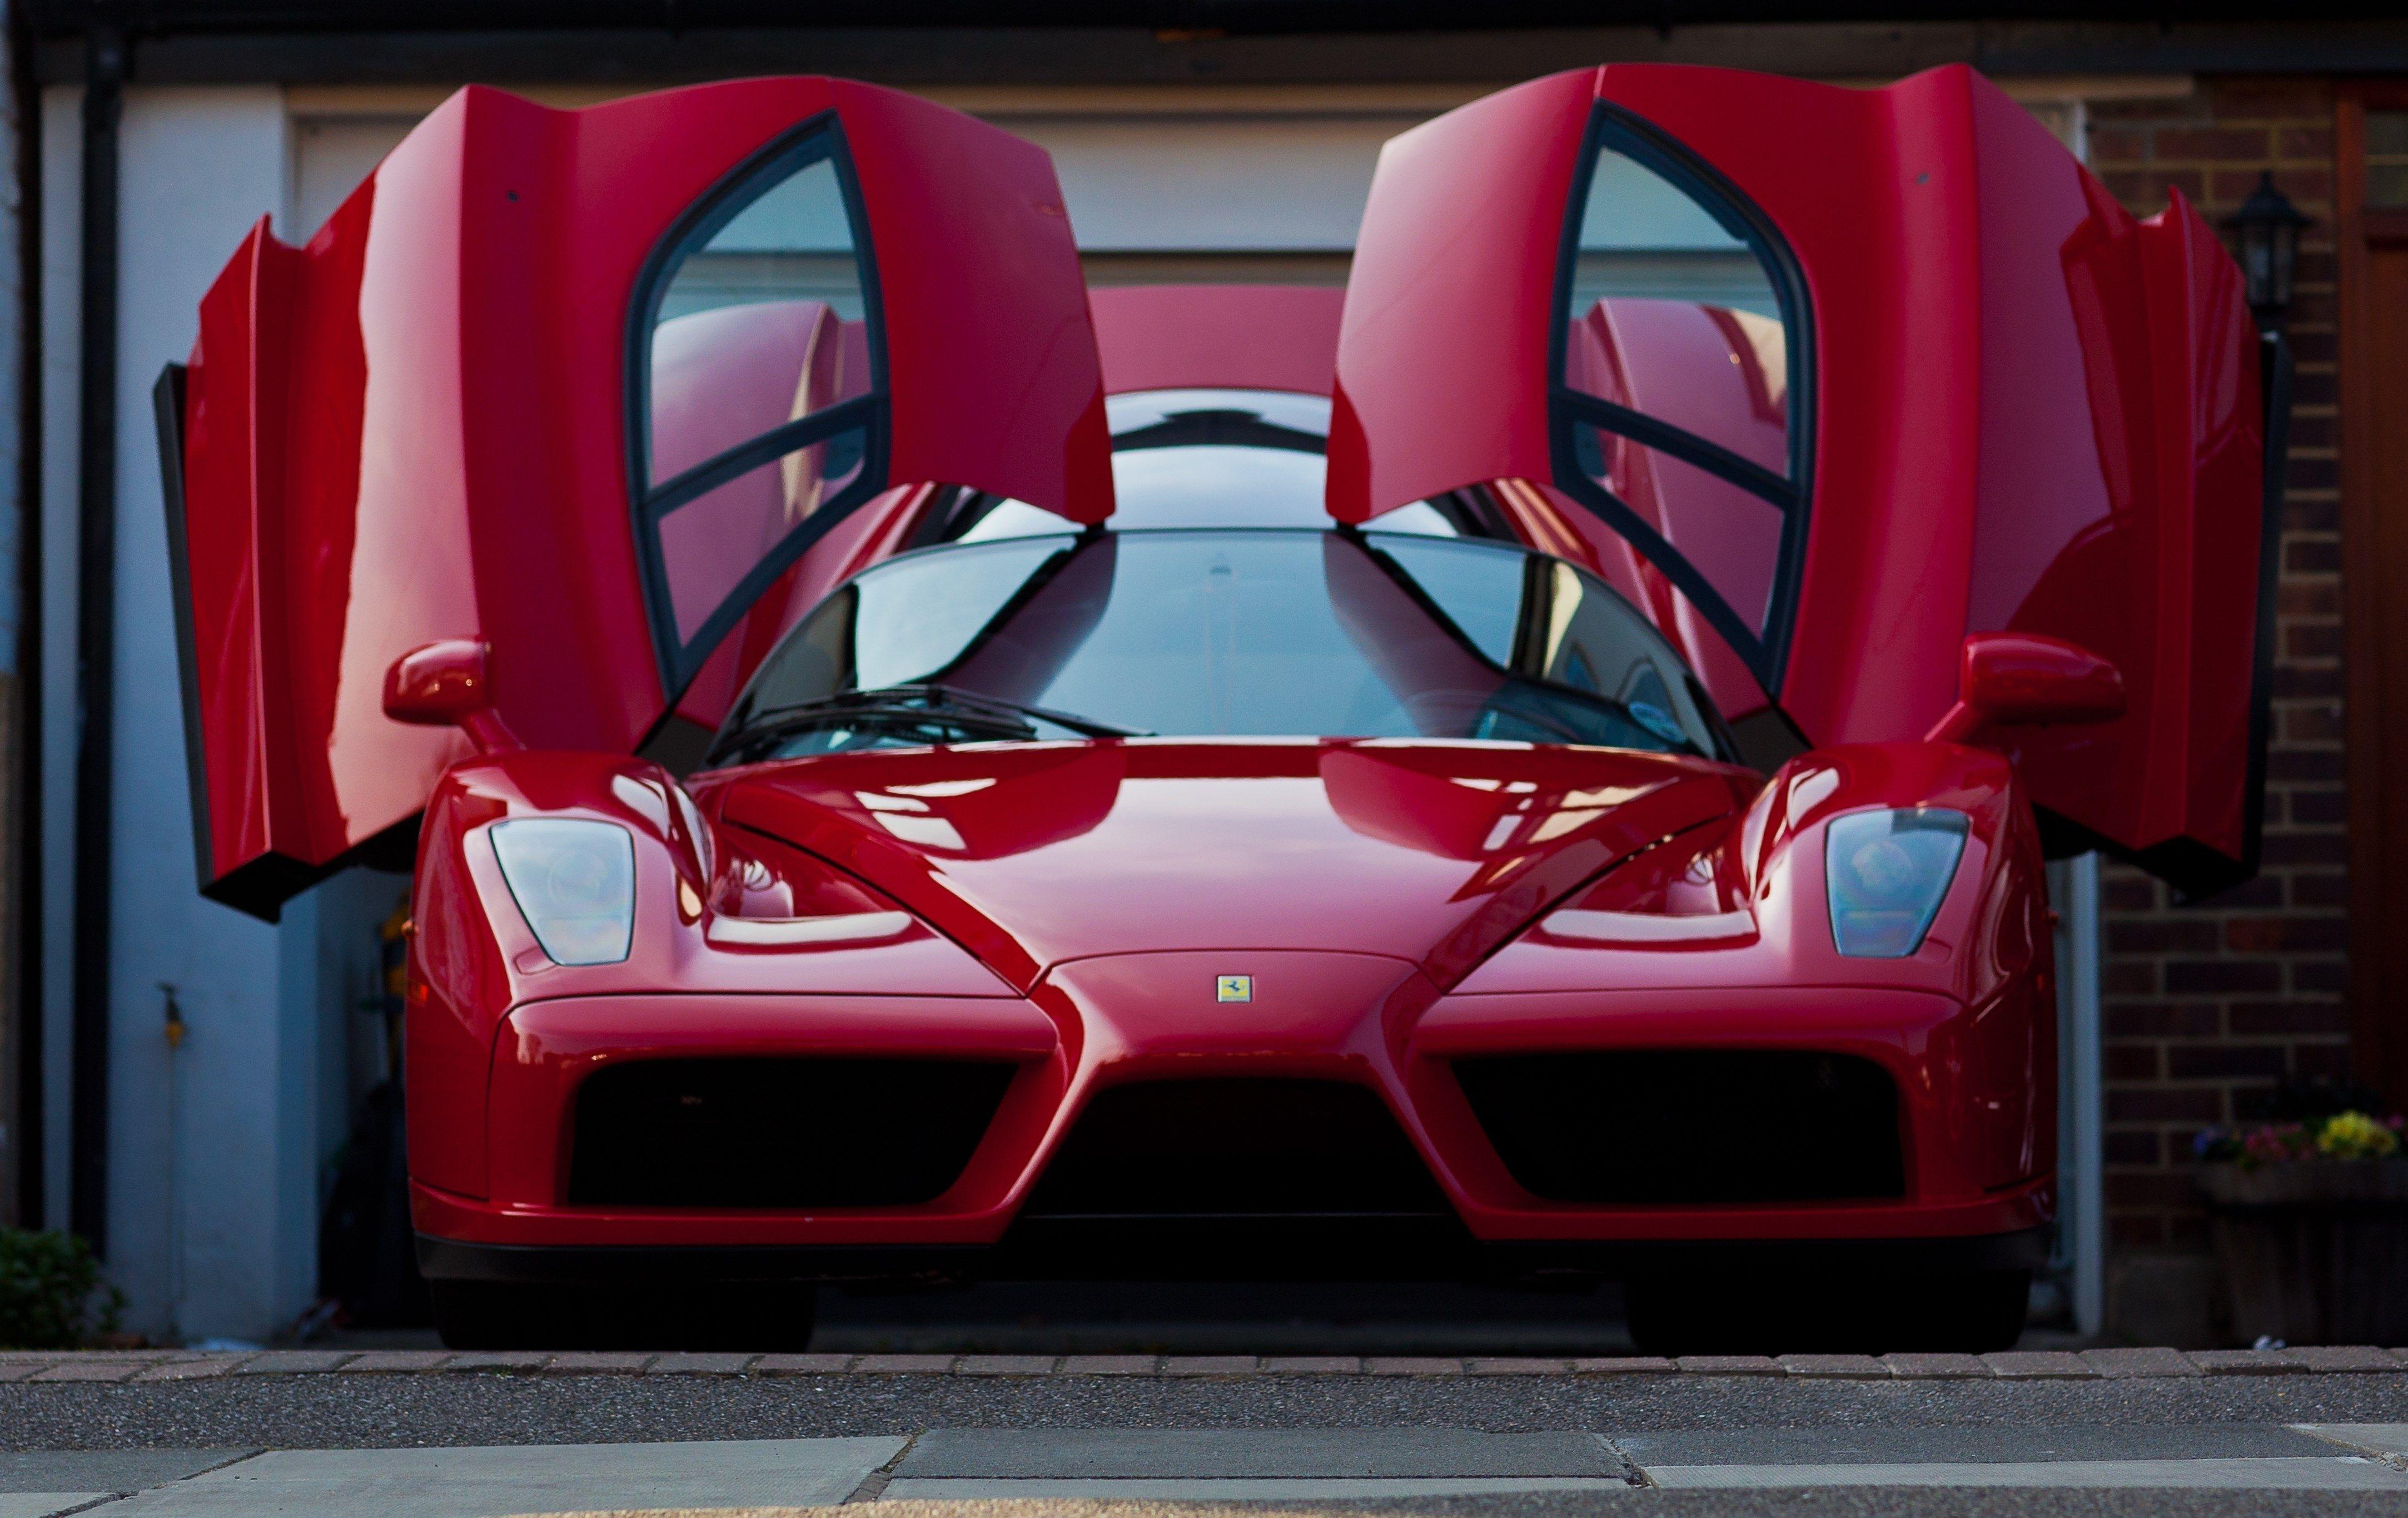 4k Ferrari Enzo Hd Wallpaper 4332x2730 Ferrarienzowallpapers Ferrari Ferrari Enzo Latest Ferrari